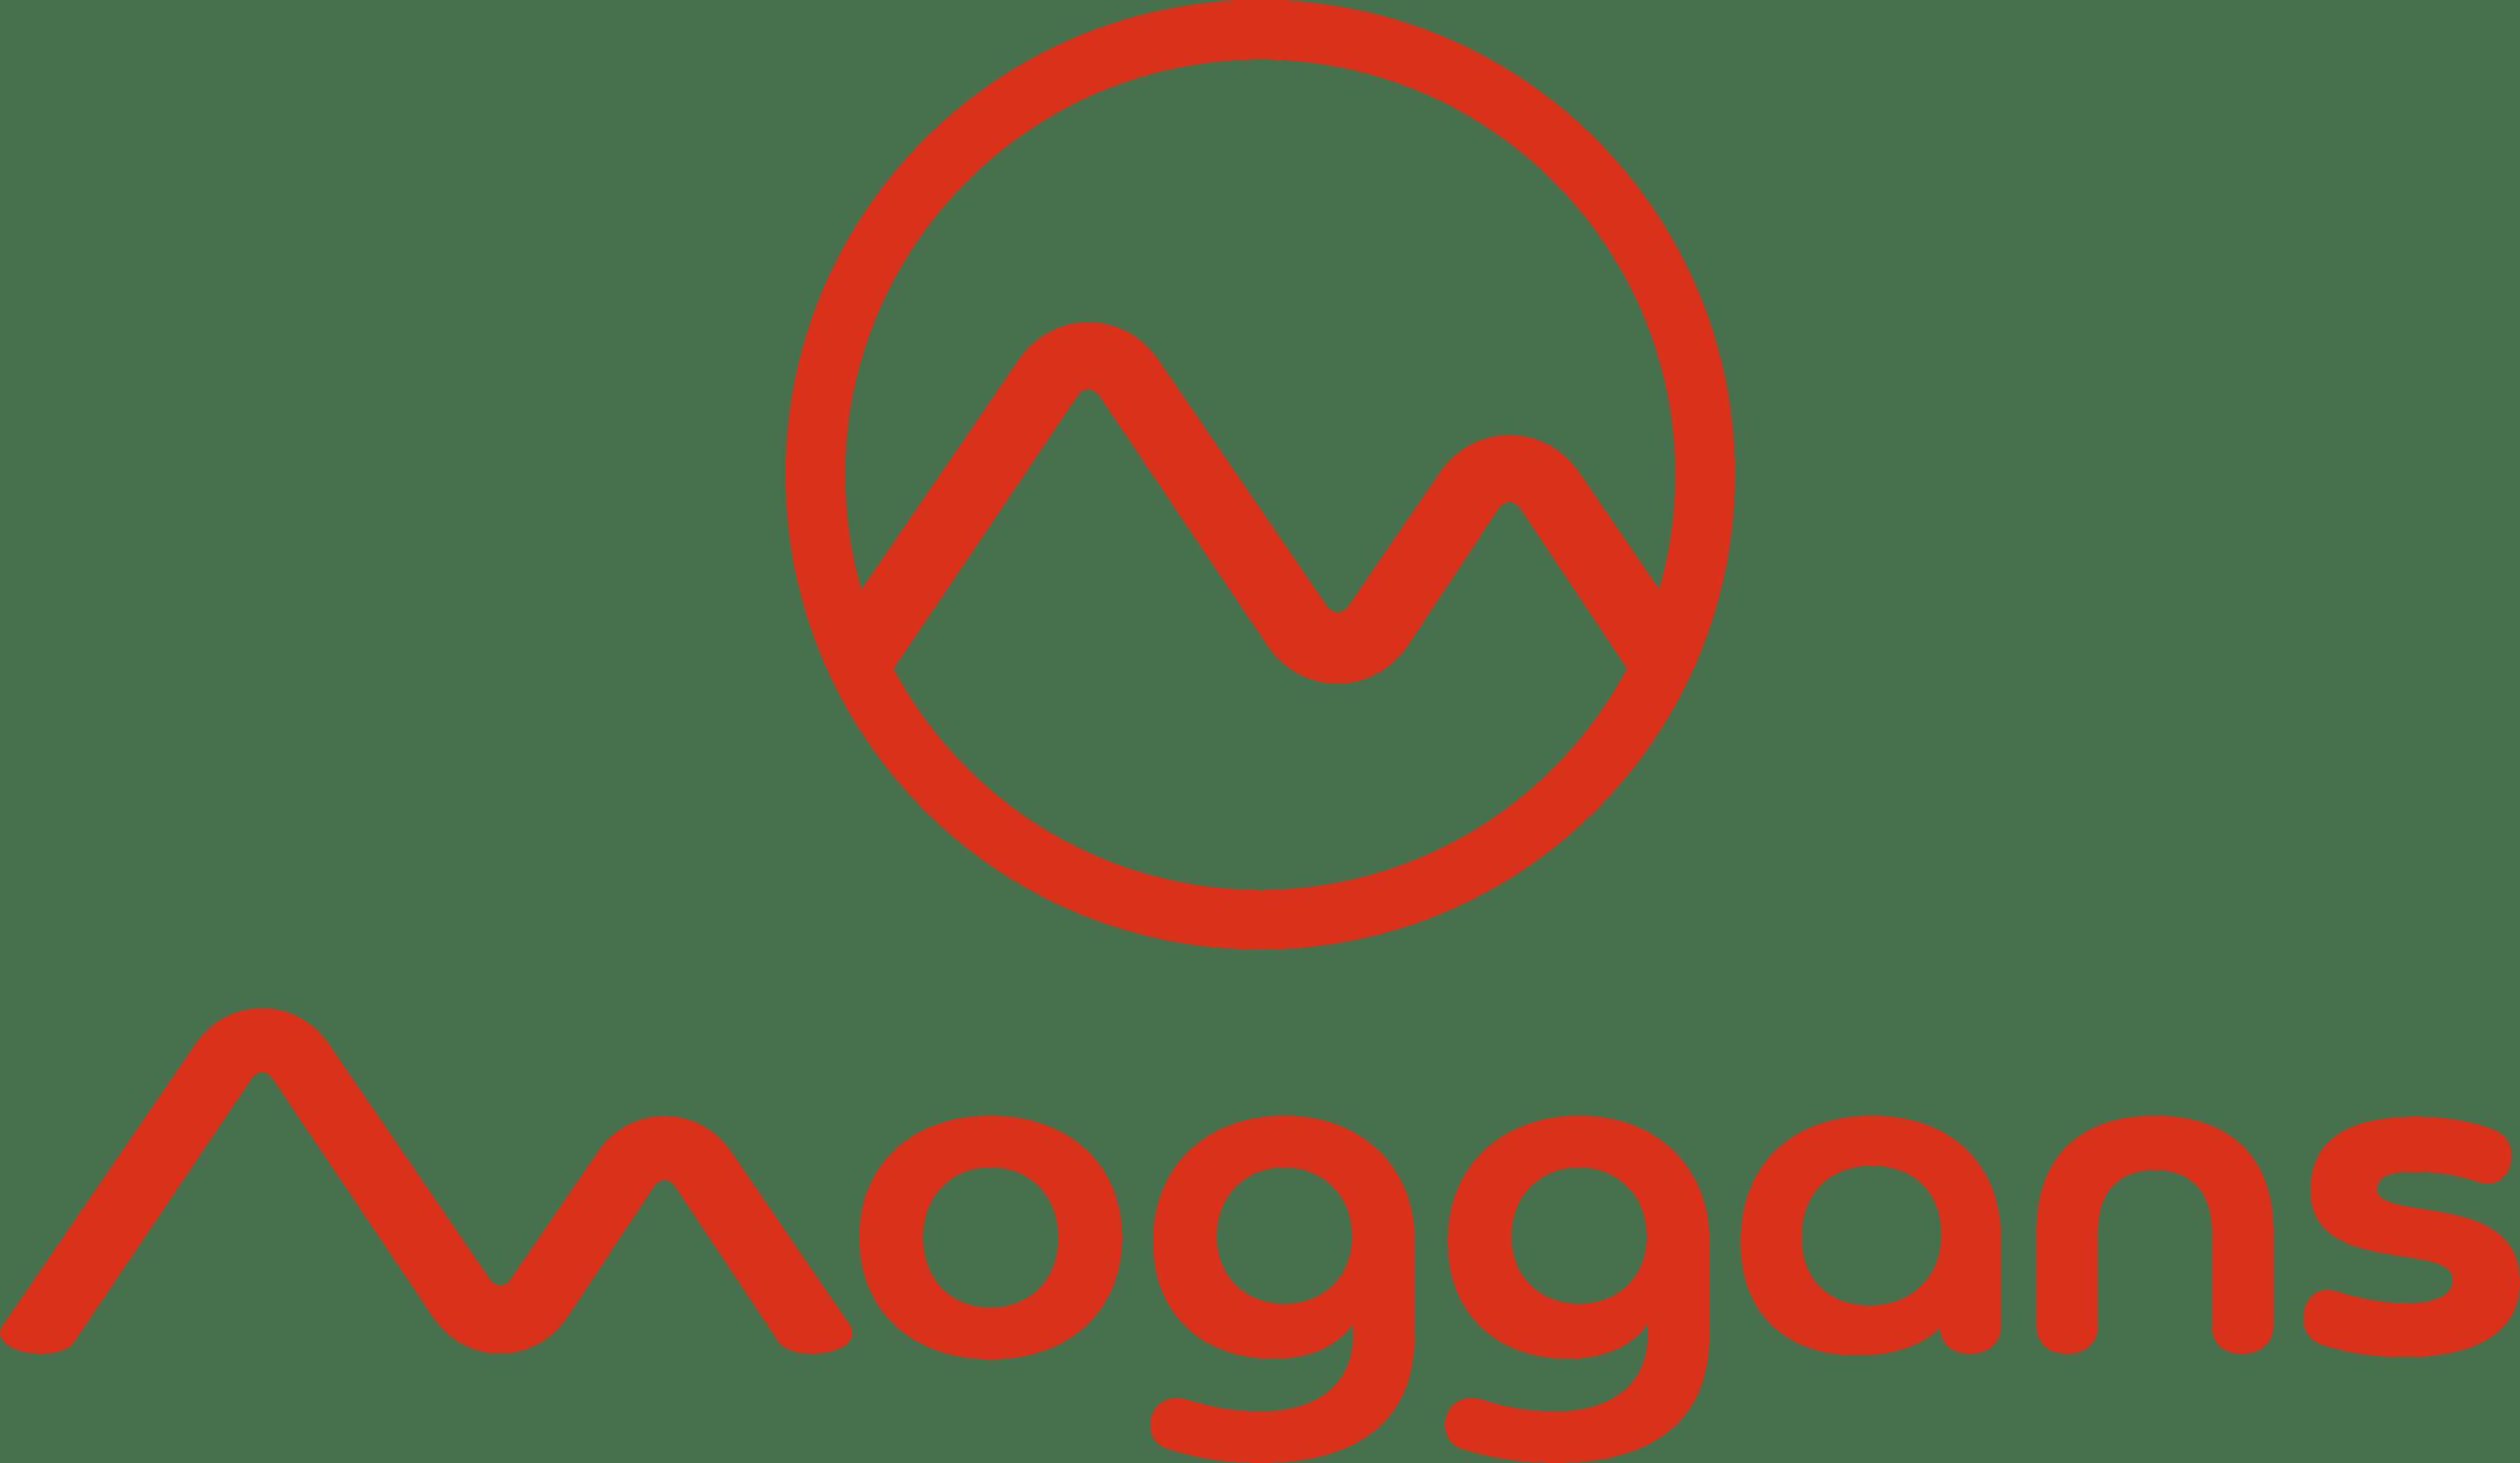 Moggans